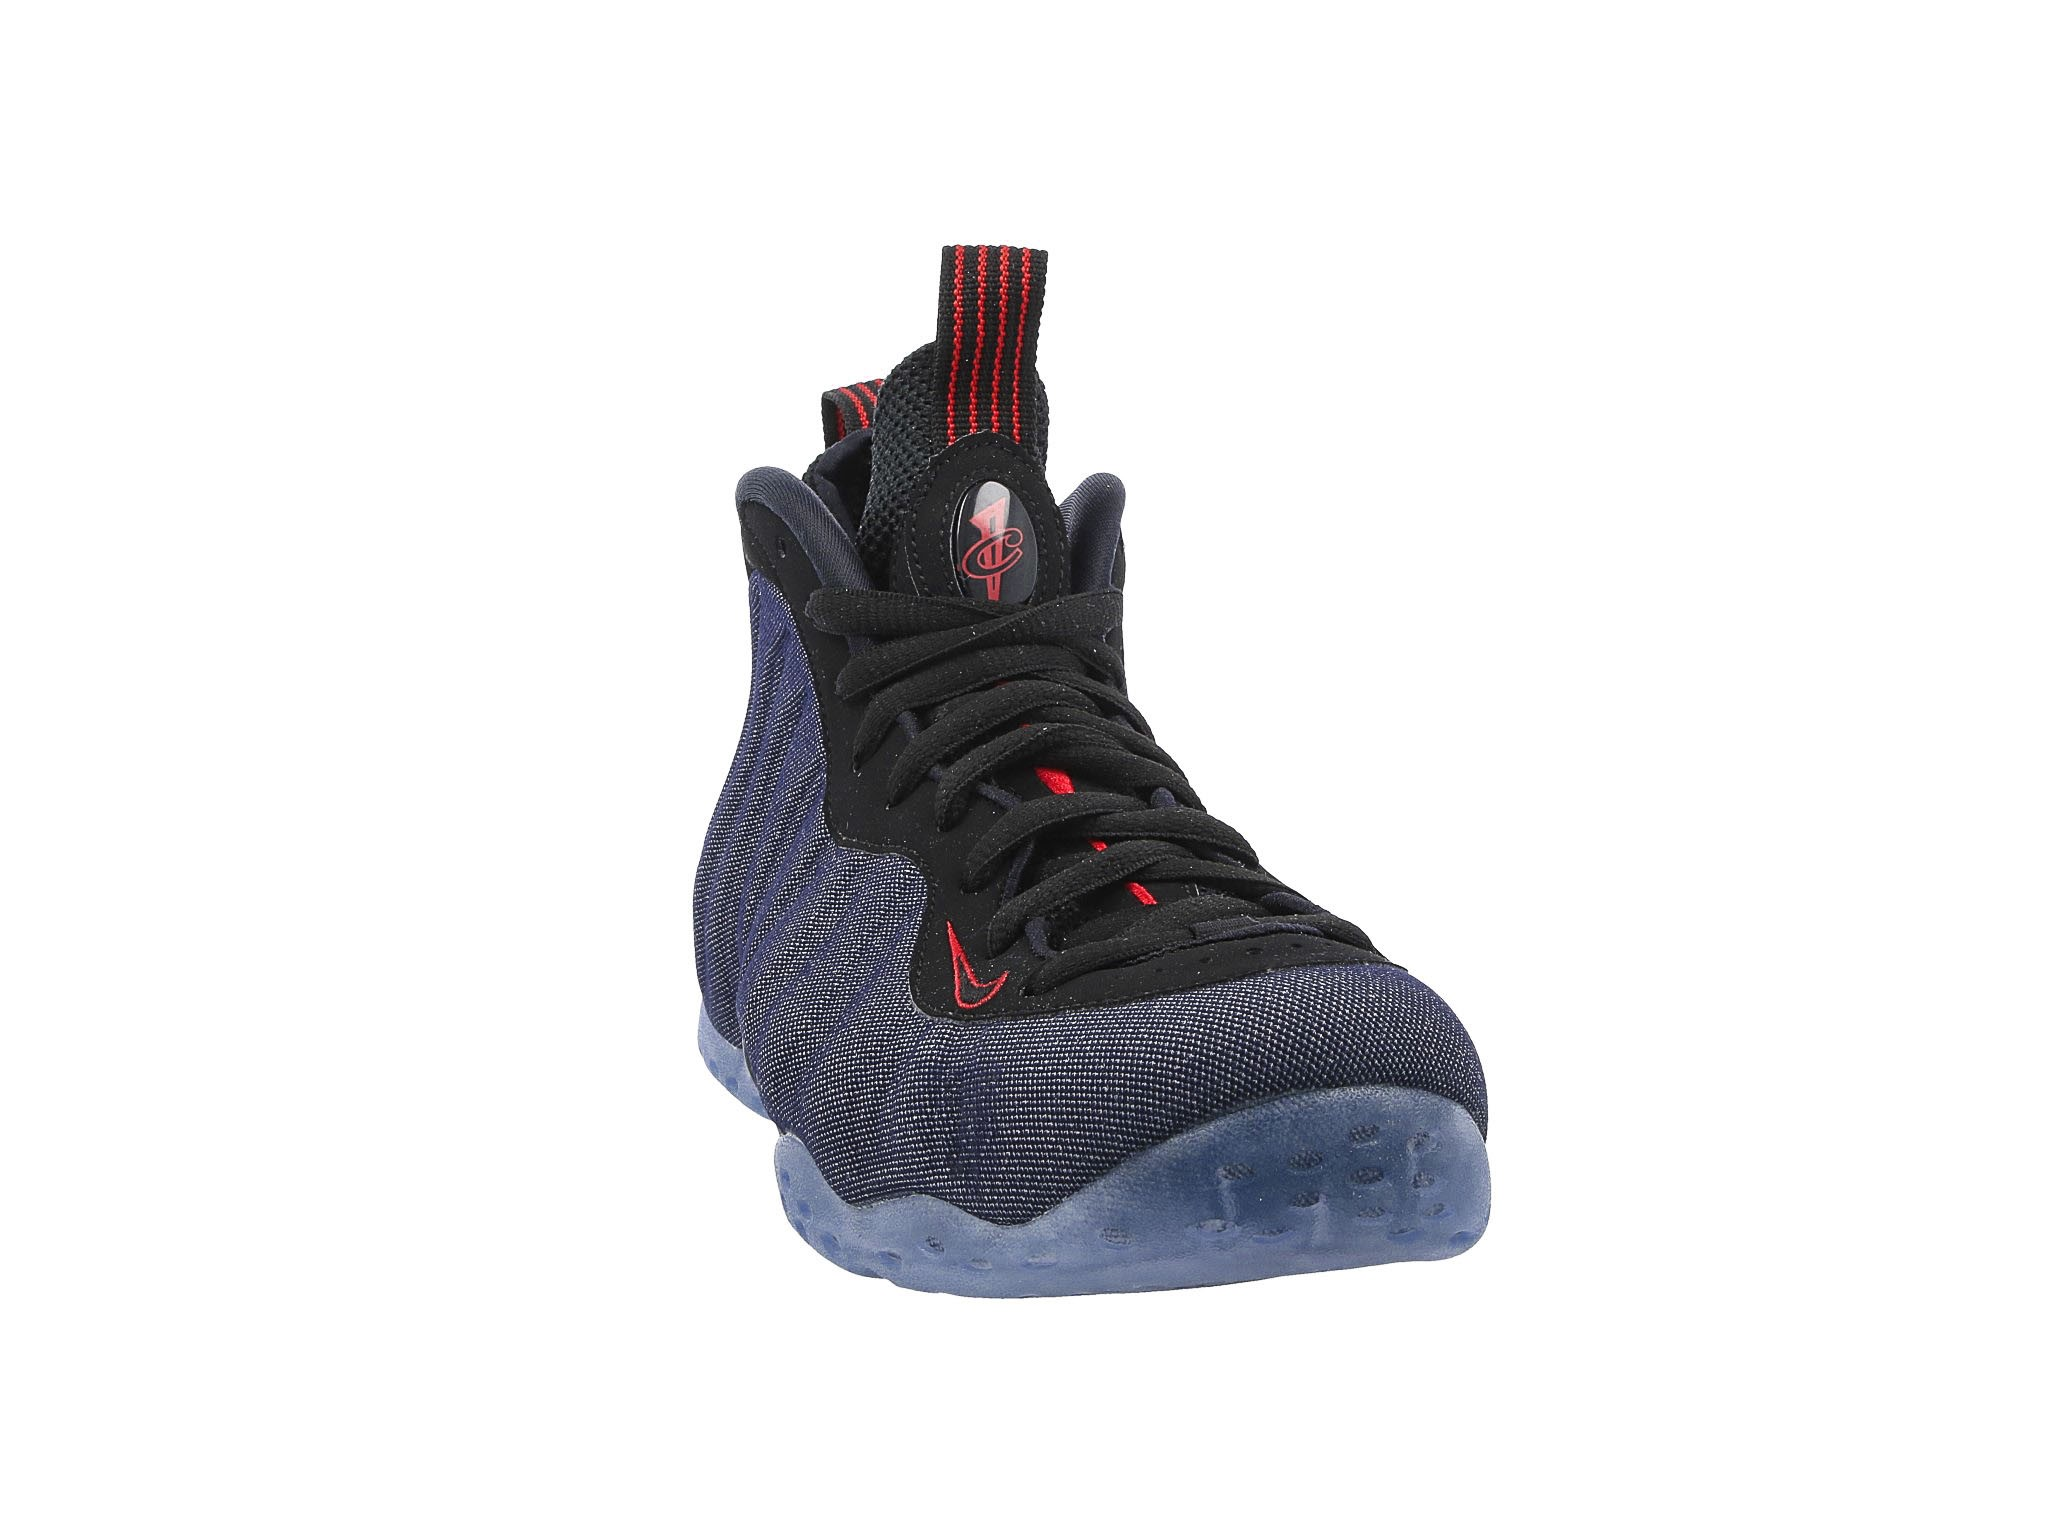 Cipő NIKE Air Foamposite One 314996 404 ObsidianBlack